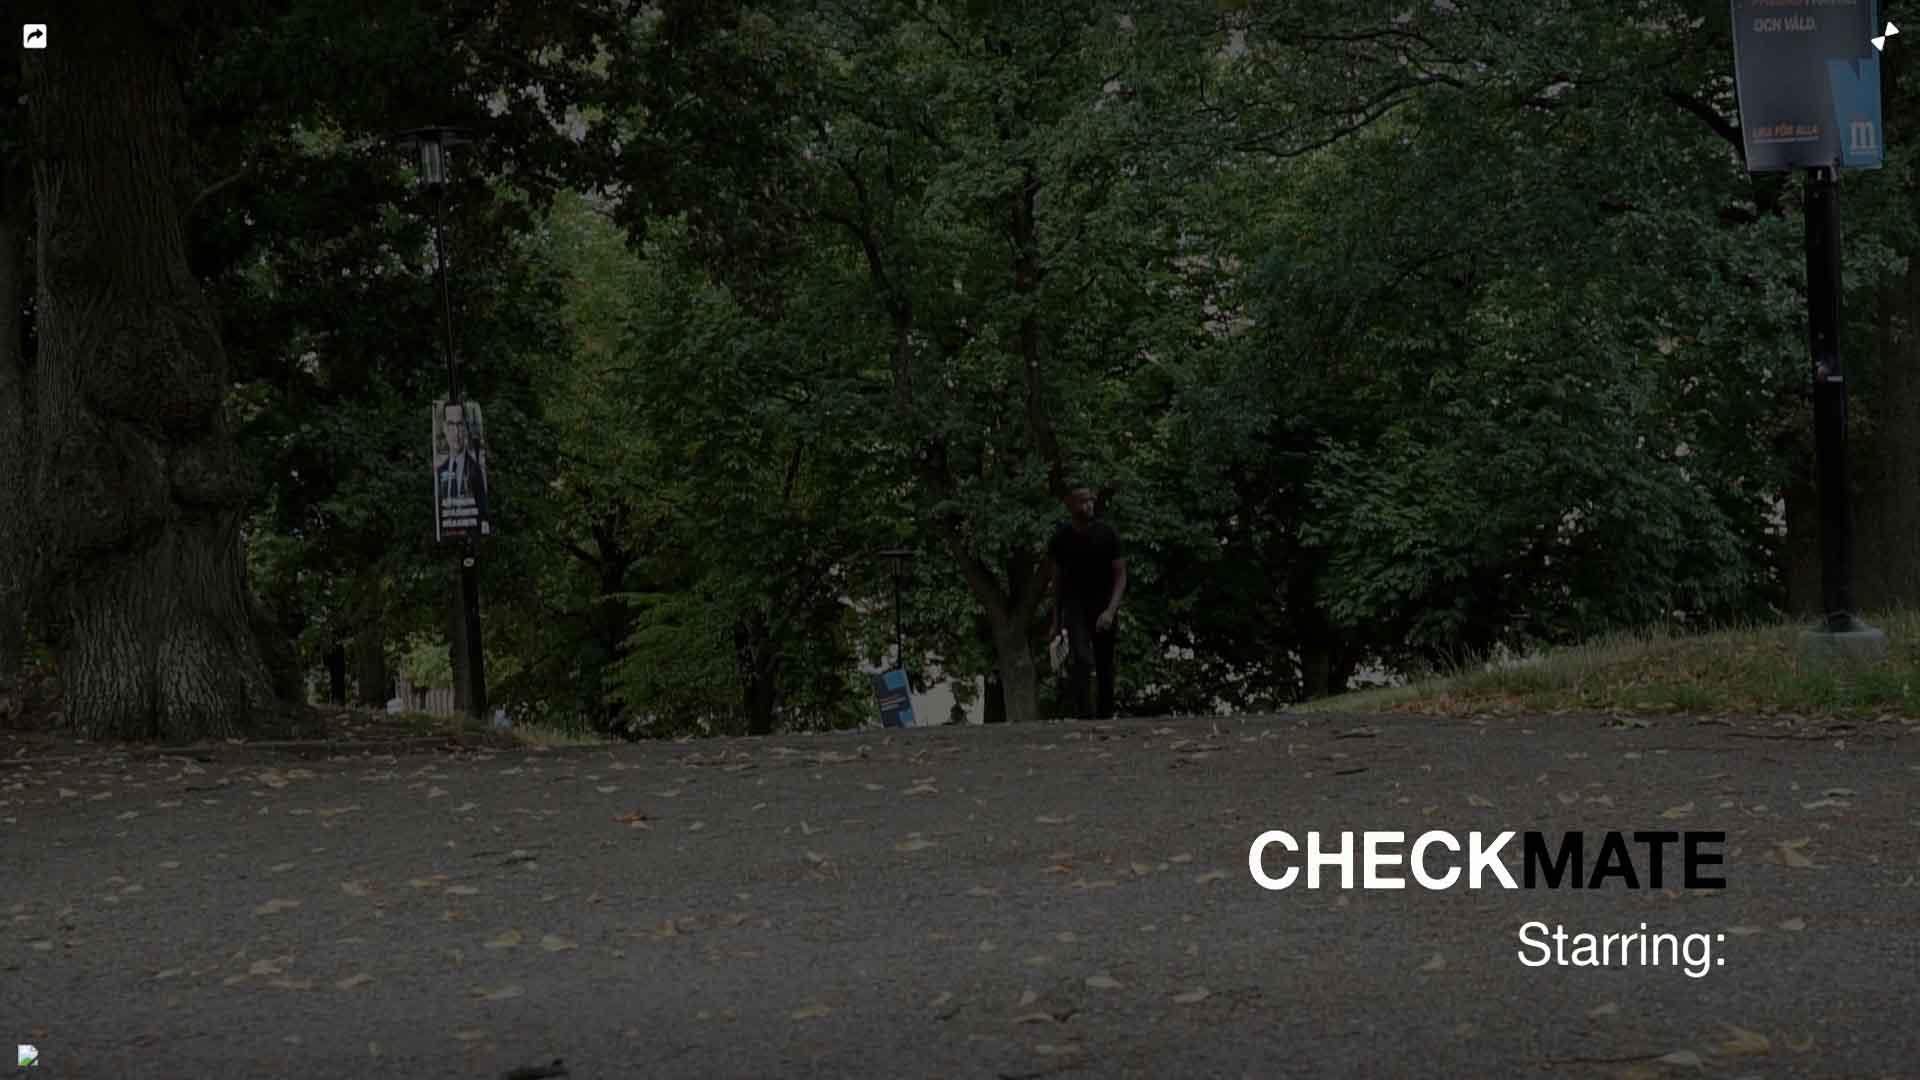 Checkmate-Abdelaziz